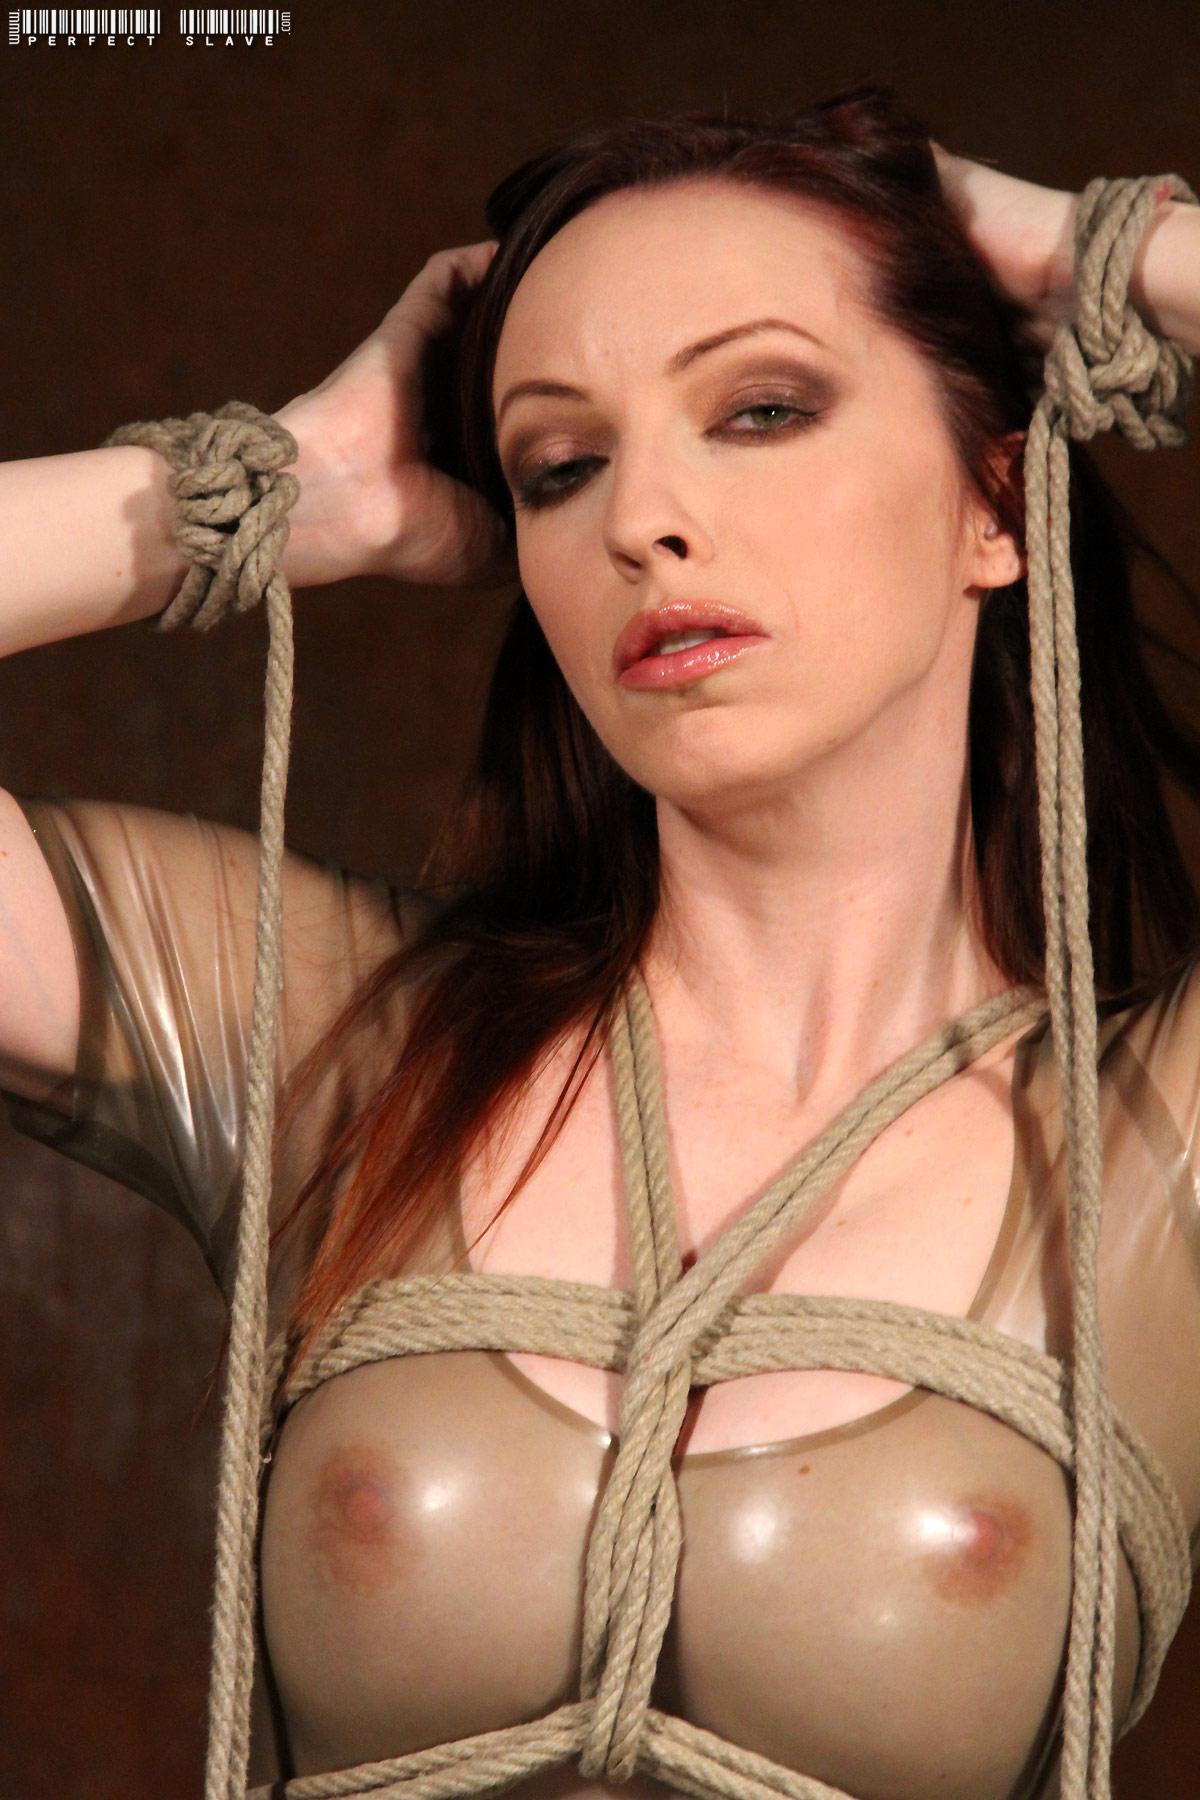 Bondage slave dressing movie